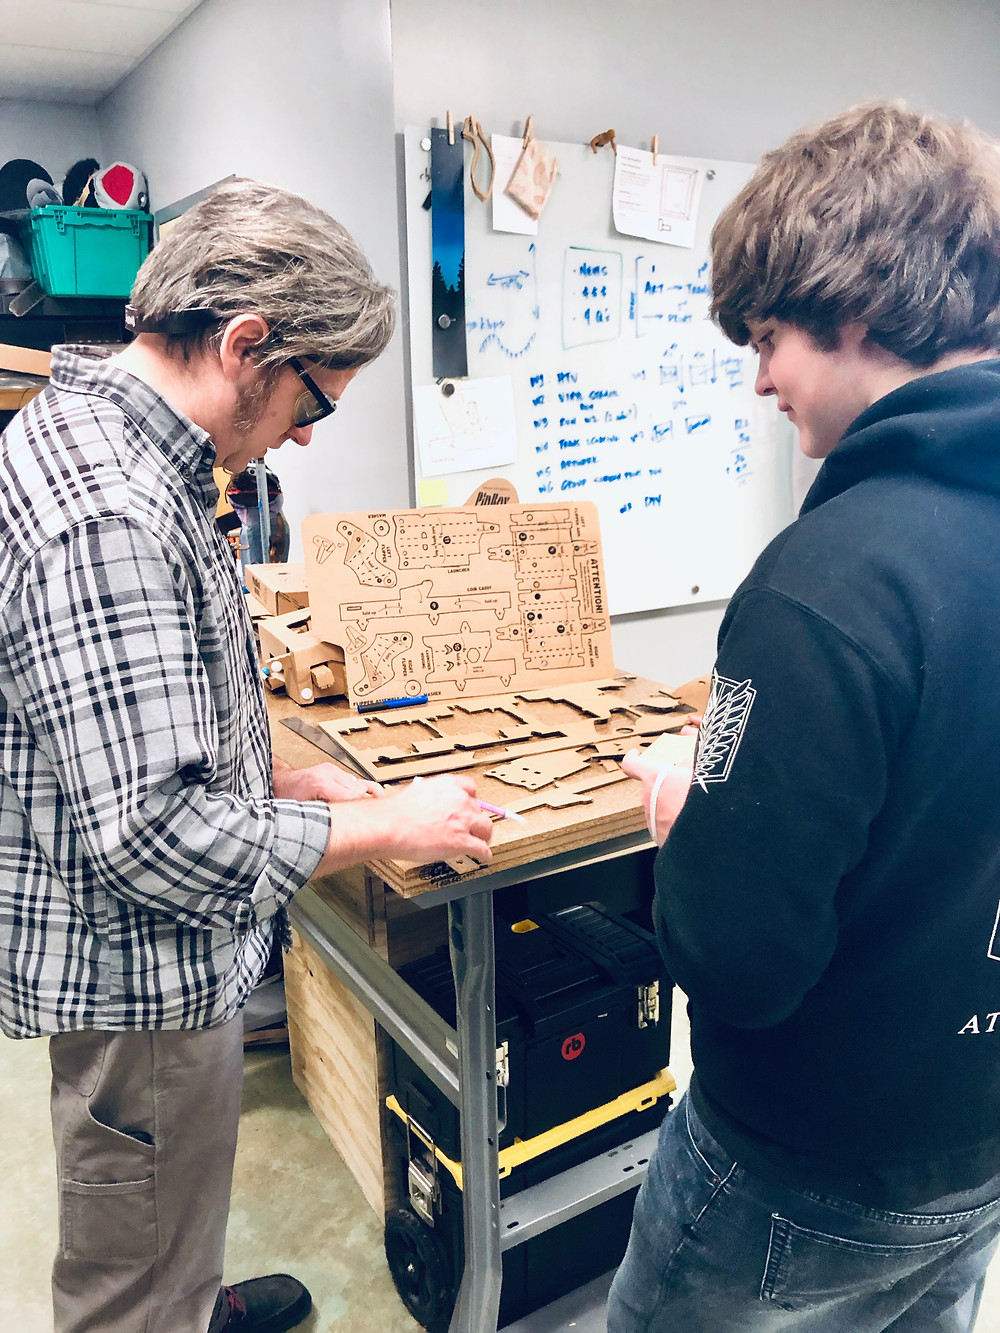 Matthew Craig (VW eLab specialist) and Kaleb Hale (freshman) analyze construction of the pinball playboard.